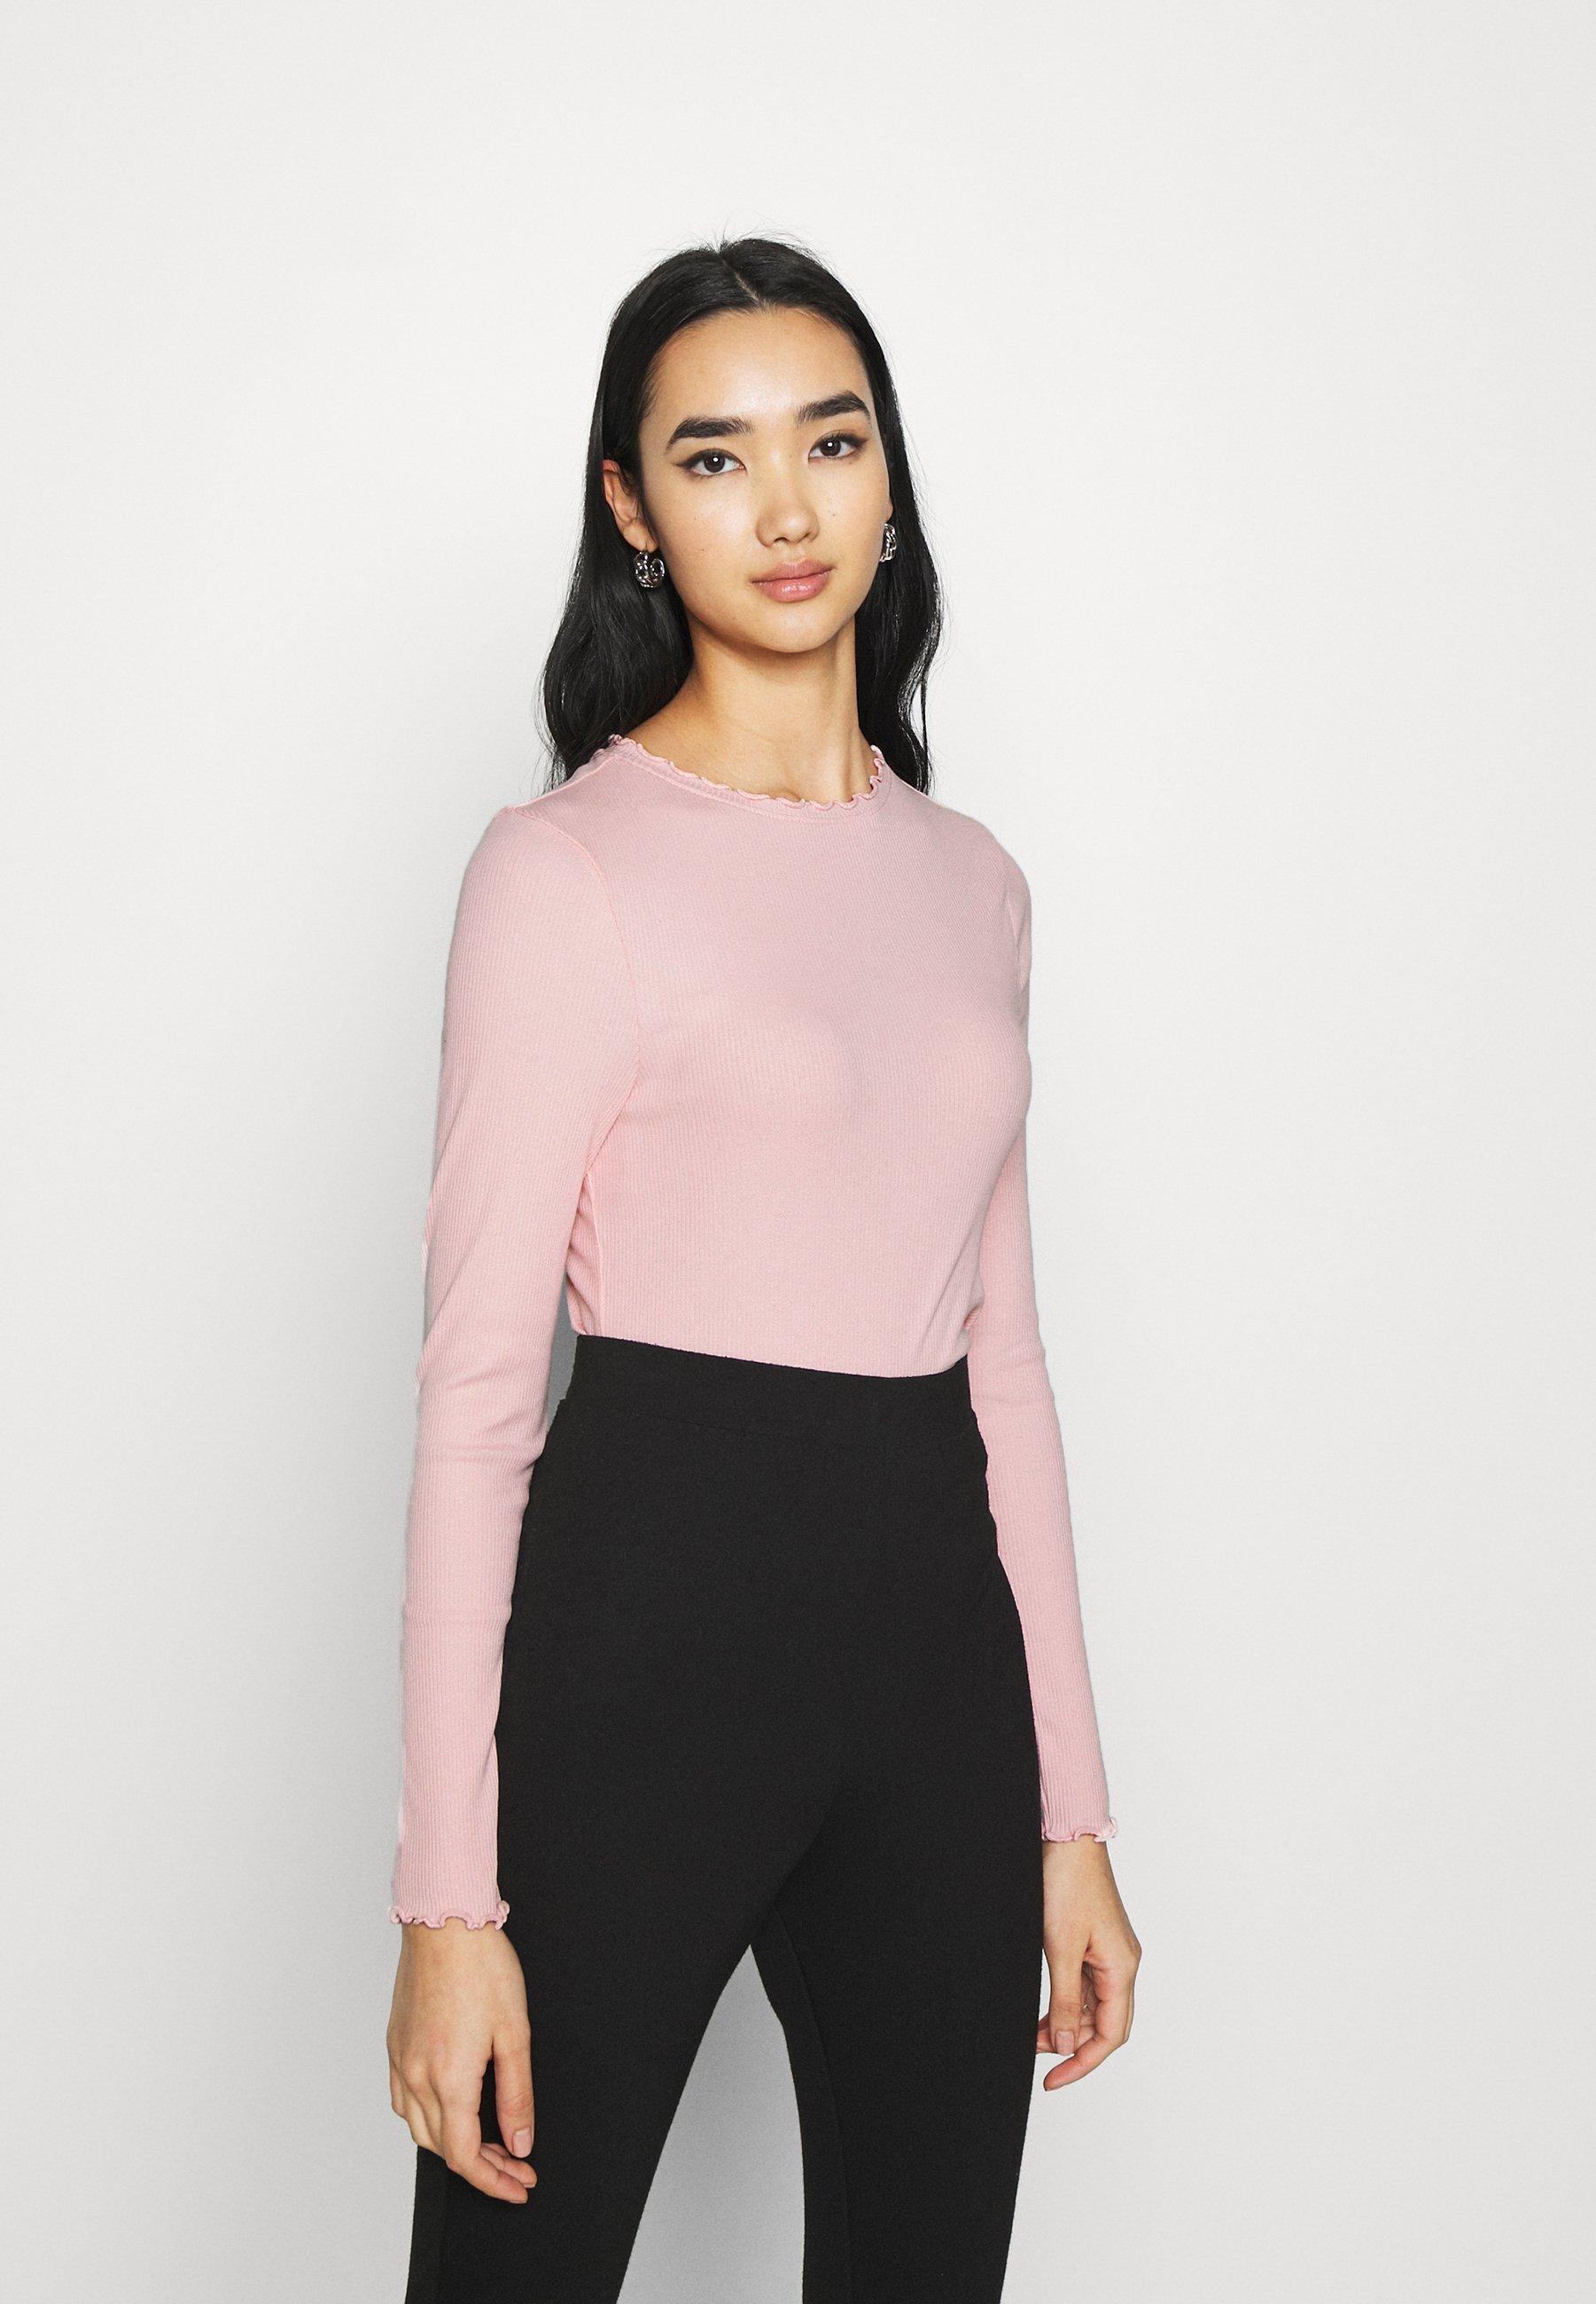 Femme BABYLOCK TEE - T-shirt à manches longues - light pink